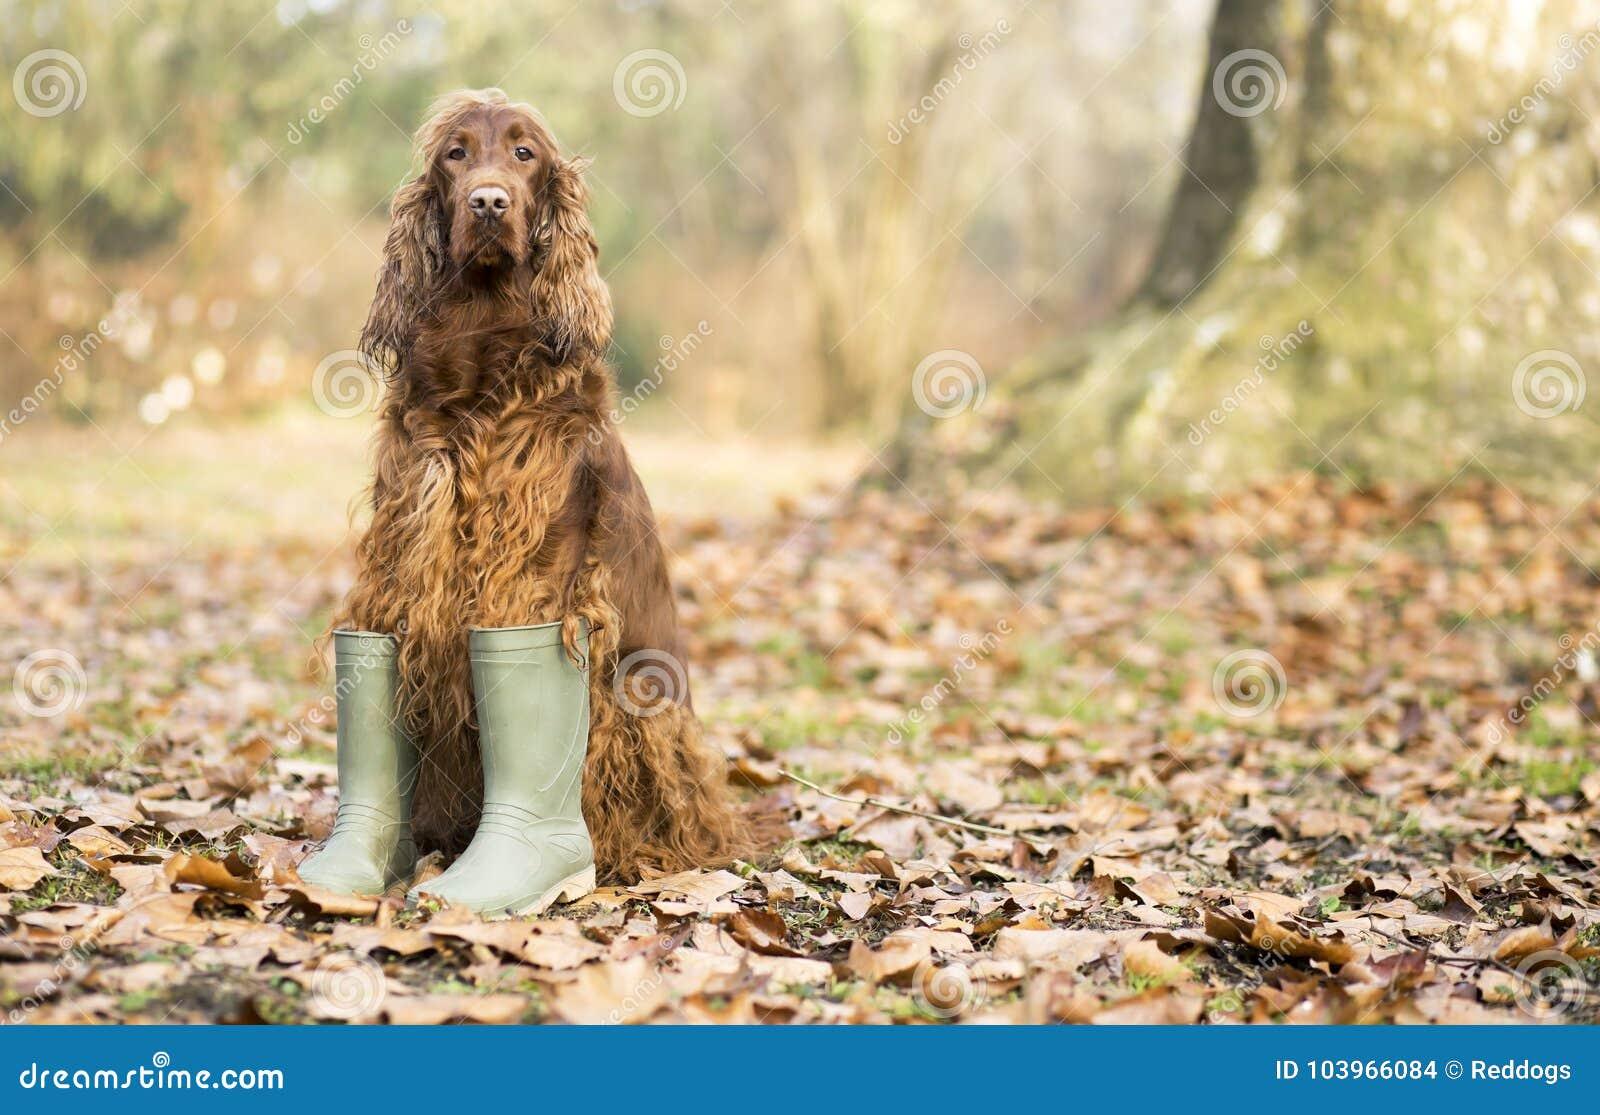 034421fed53 Funny dog in Autumn stock photo. Image of irish, leaves - 103966084